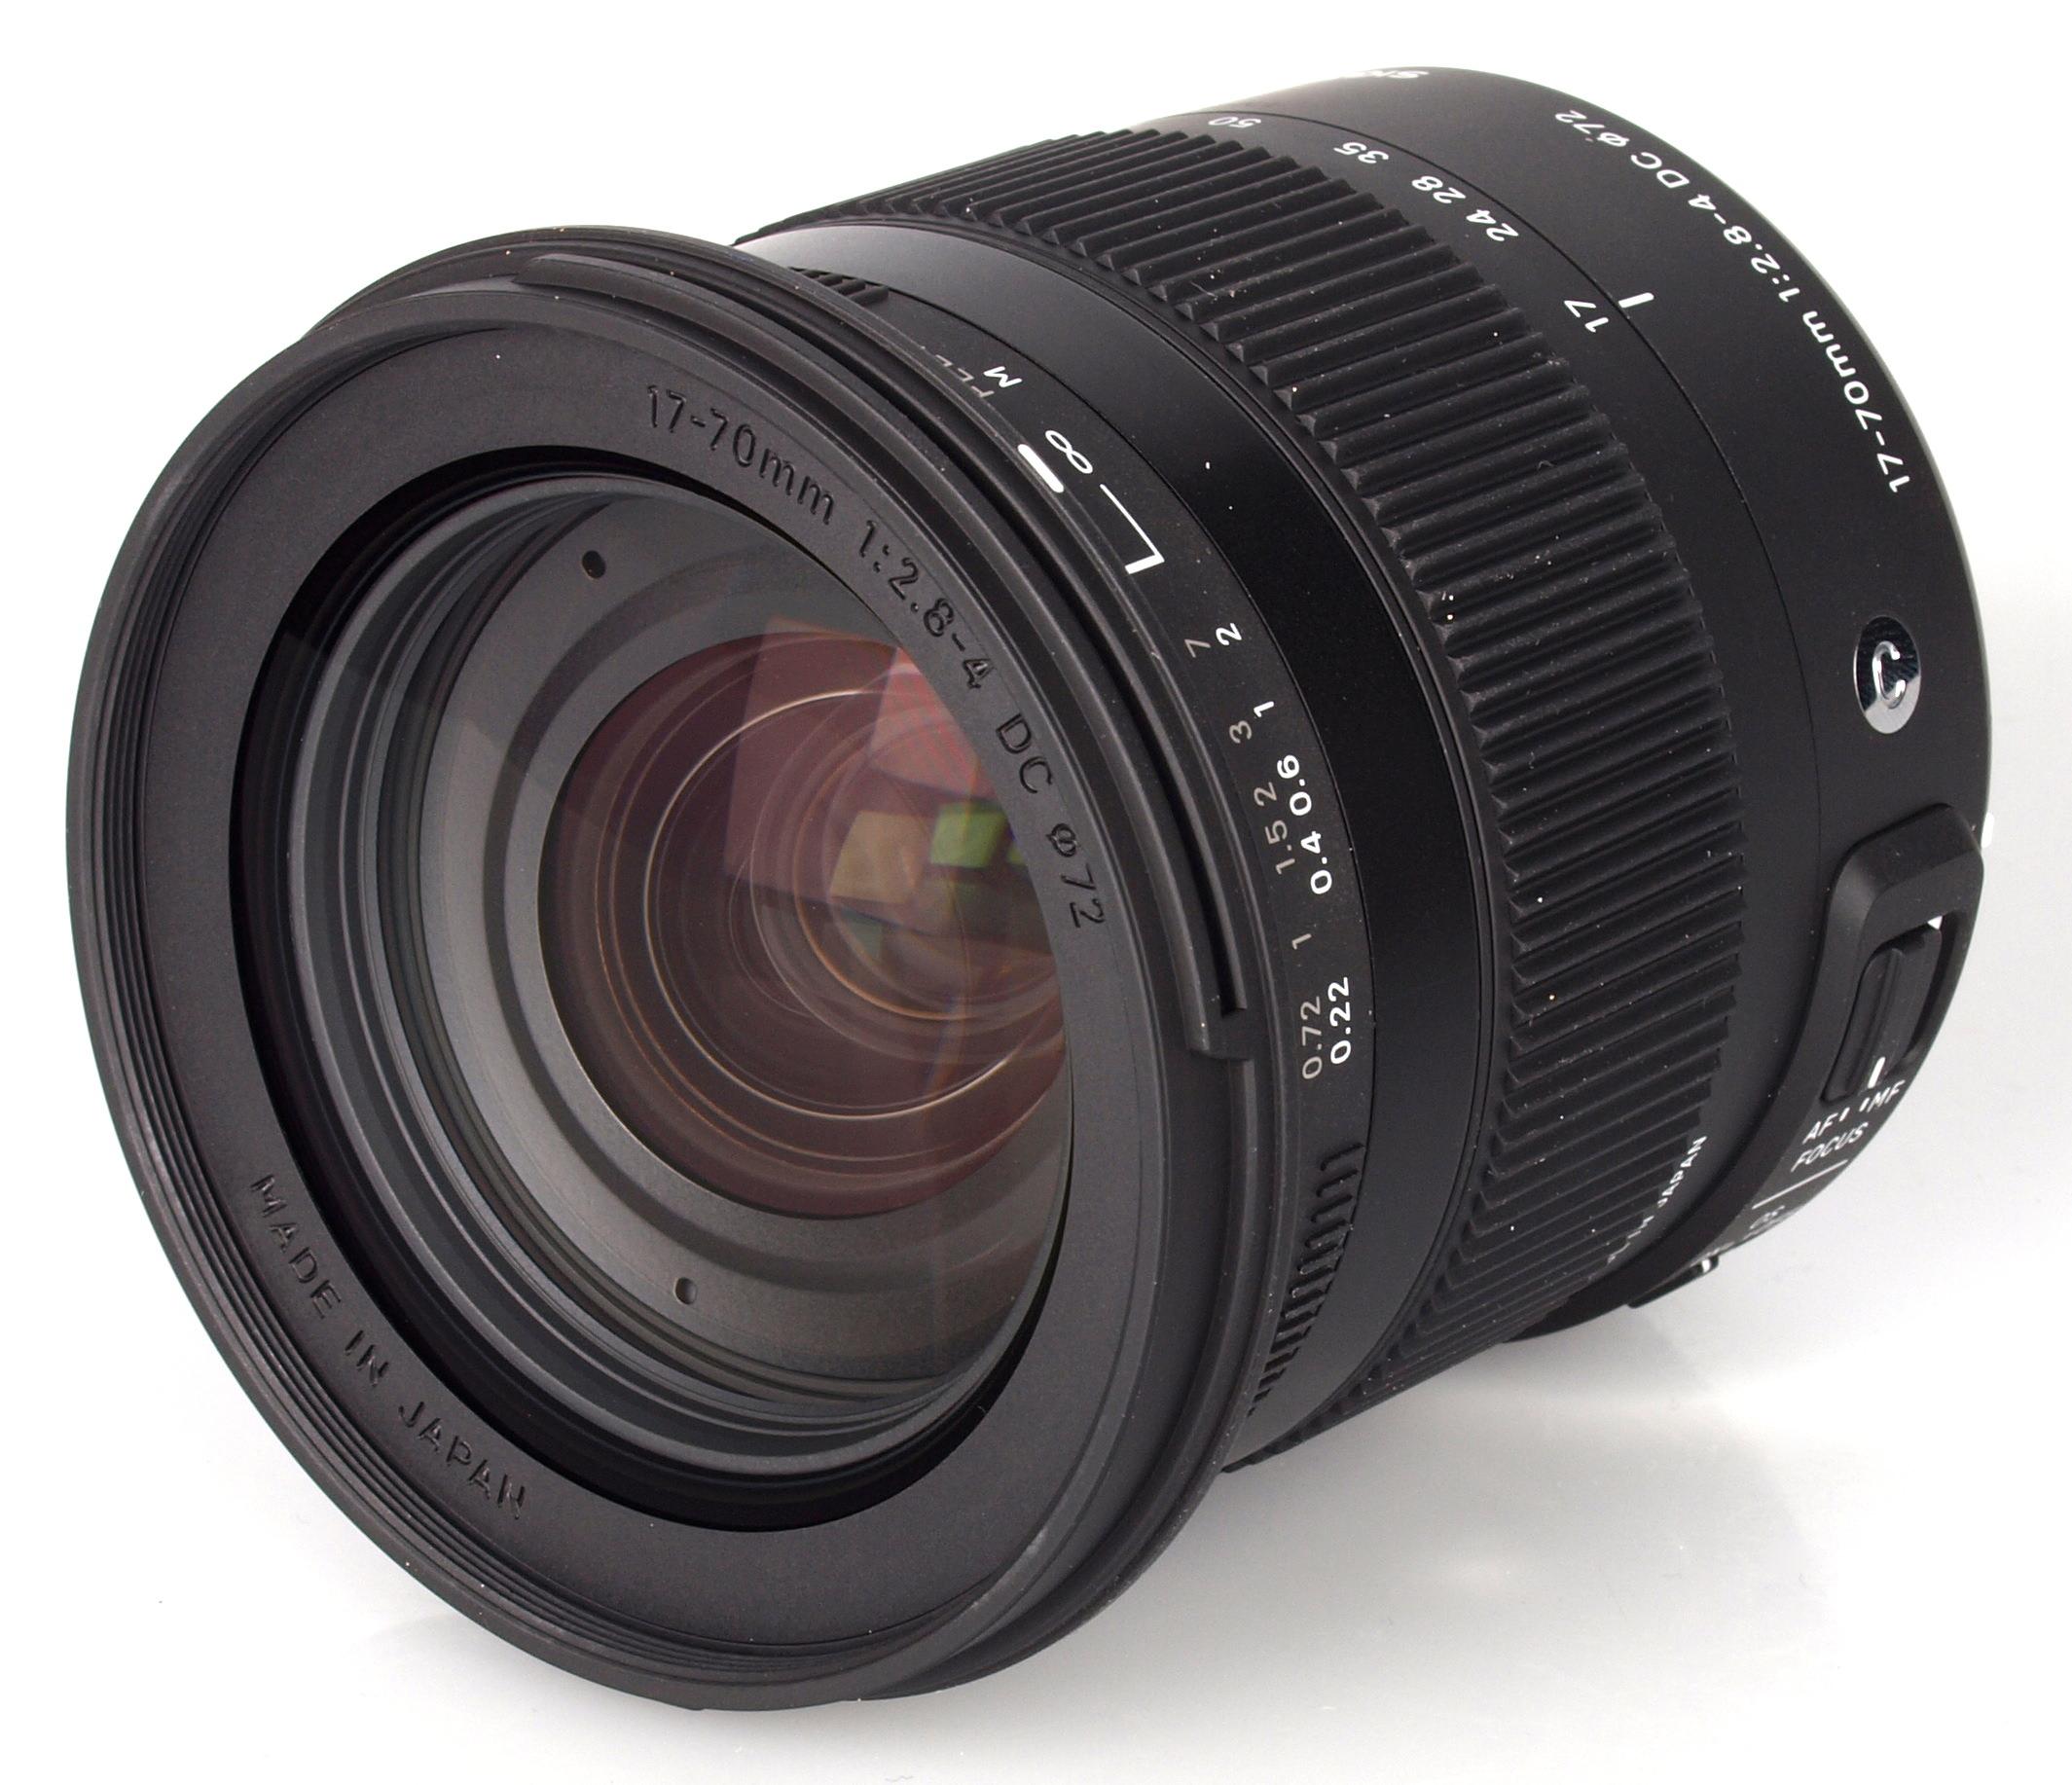 sigma 17 70mm f 2 8 4 dc macro os hsm c lens review. Black Bedroom Furniture Sets. Home Design Ideas